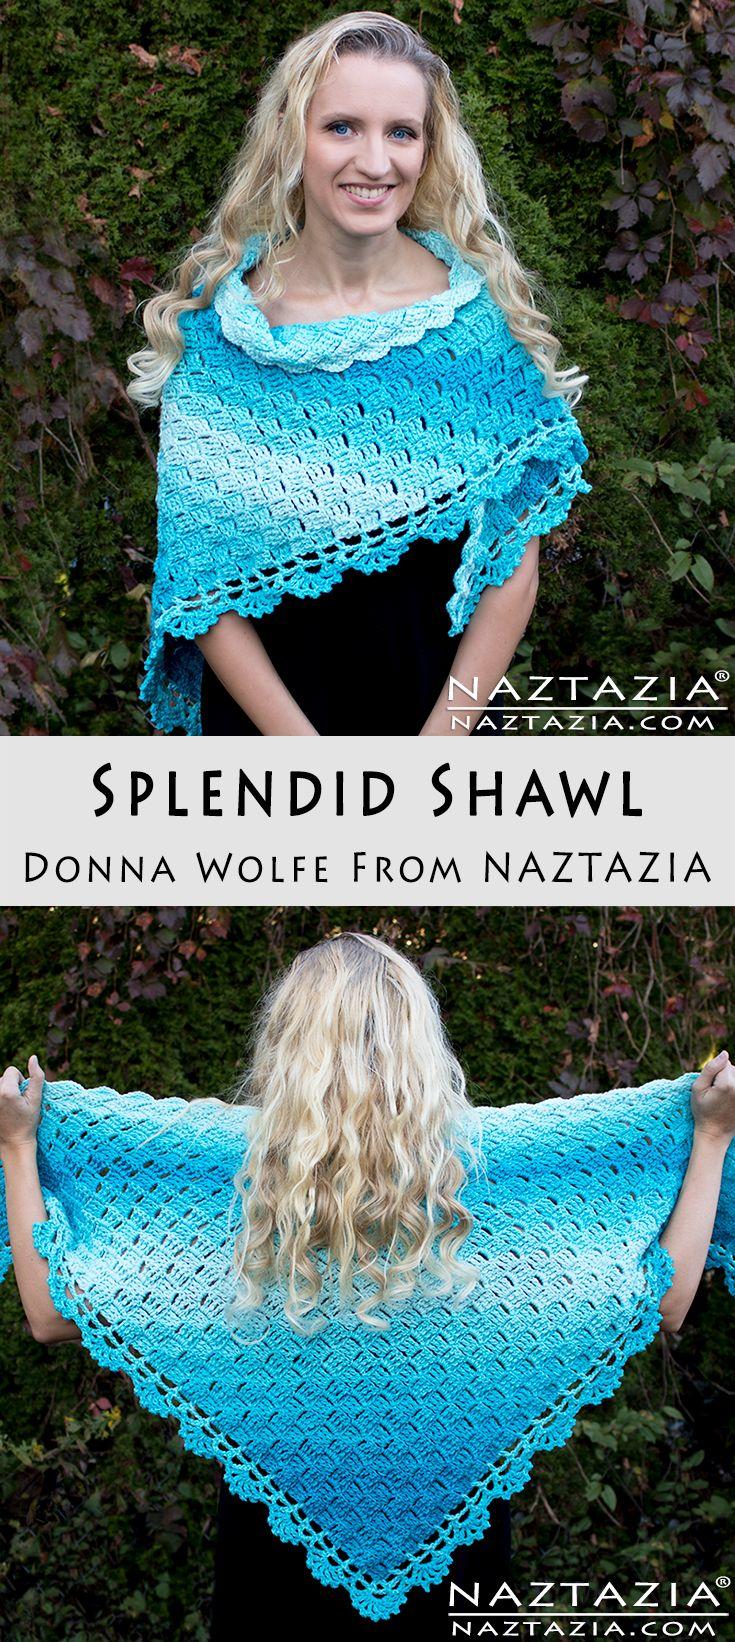 Crochet Splendid Shawl - Free Pattern & DIY Tutorial YouTube Video ...